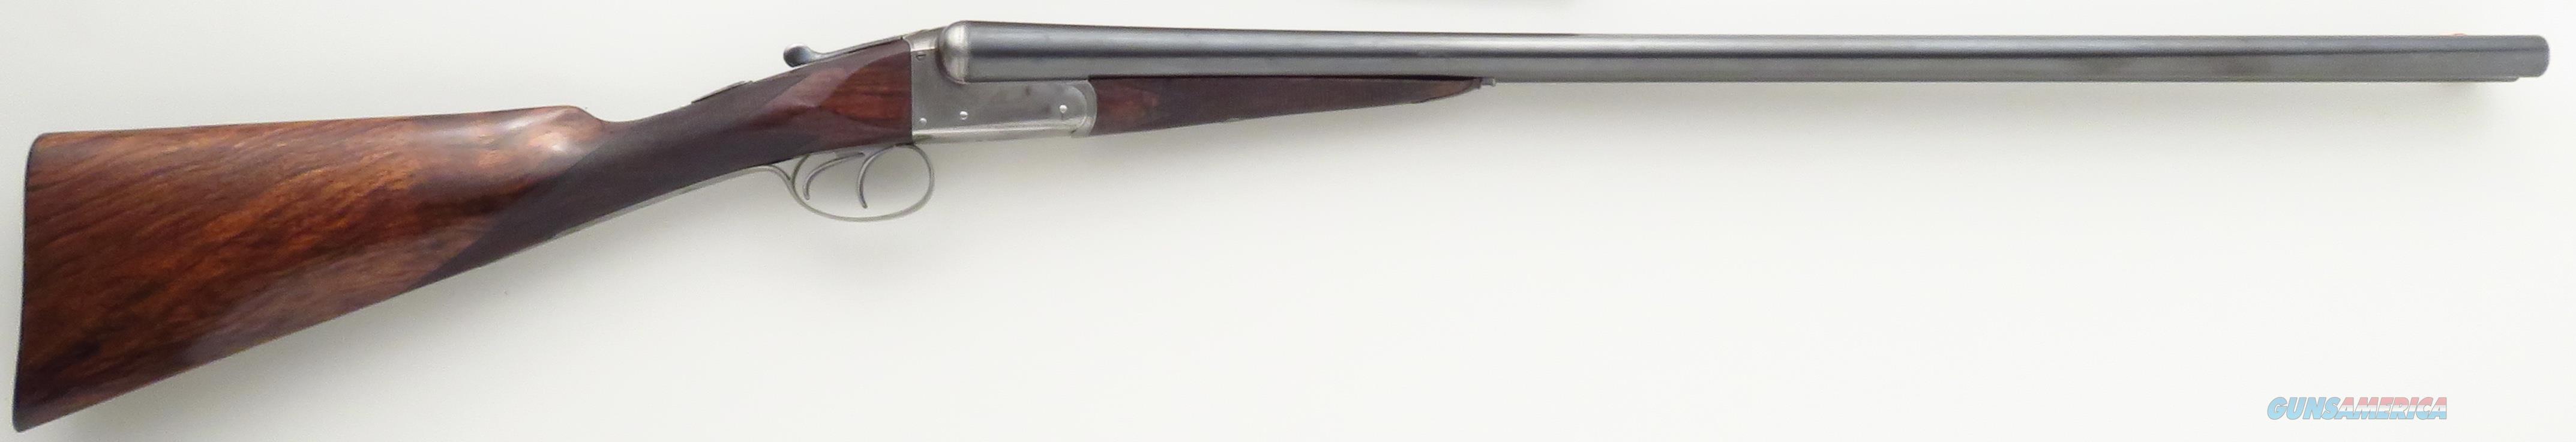 Tolley boxlock 12 gauge, 30-inch IC/F, bright & tight, maker's case,   Guns > Shotguns > TU Misc Shotguns